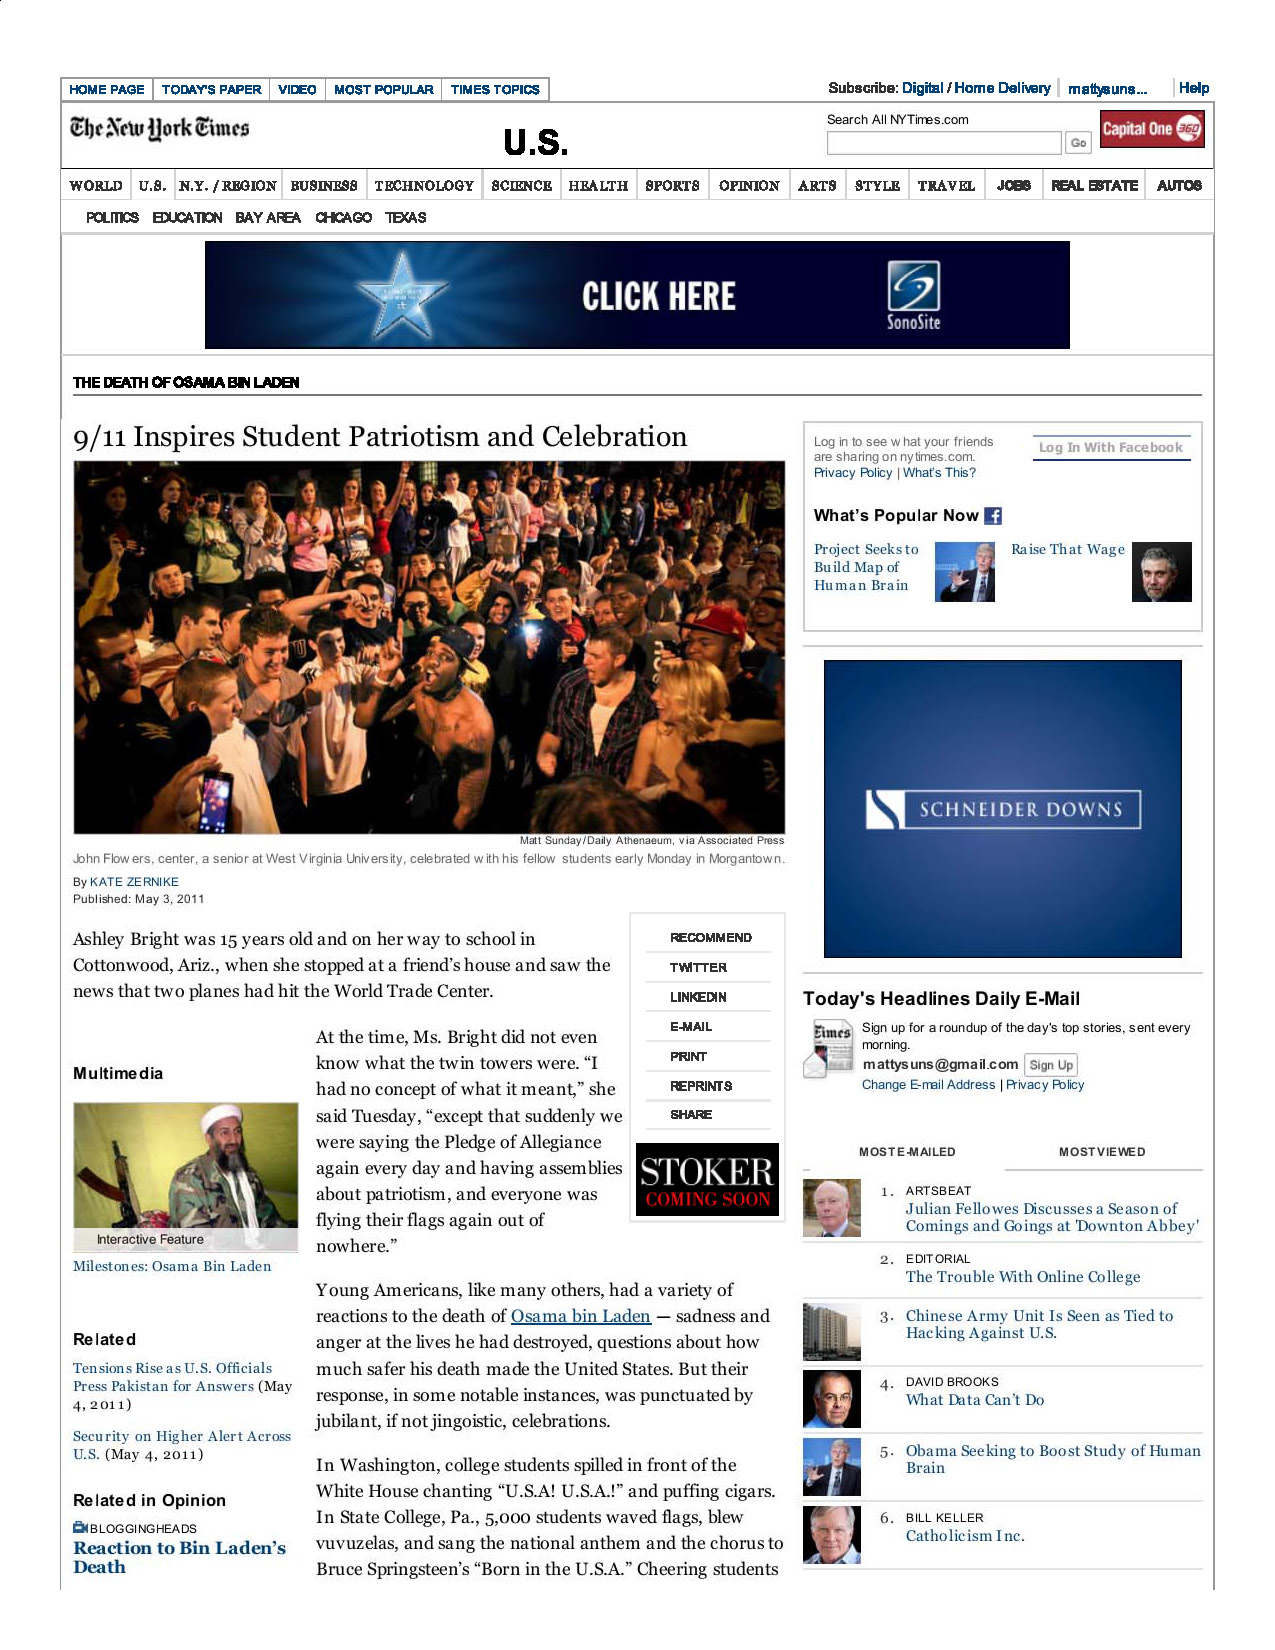 Students Celebrate Bin Laden News - NYTimes.jpg